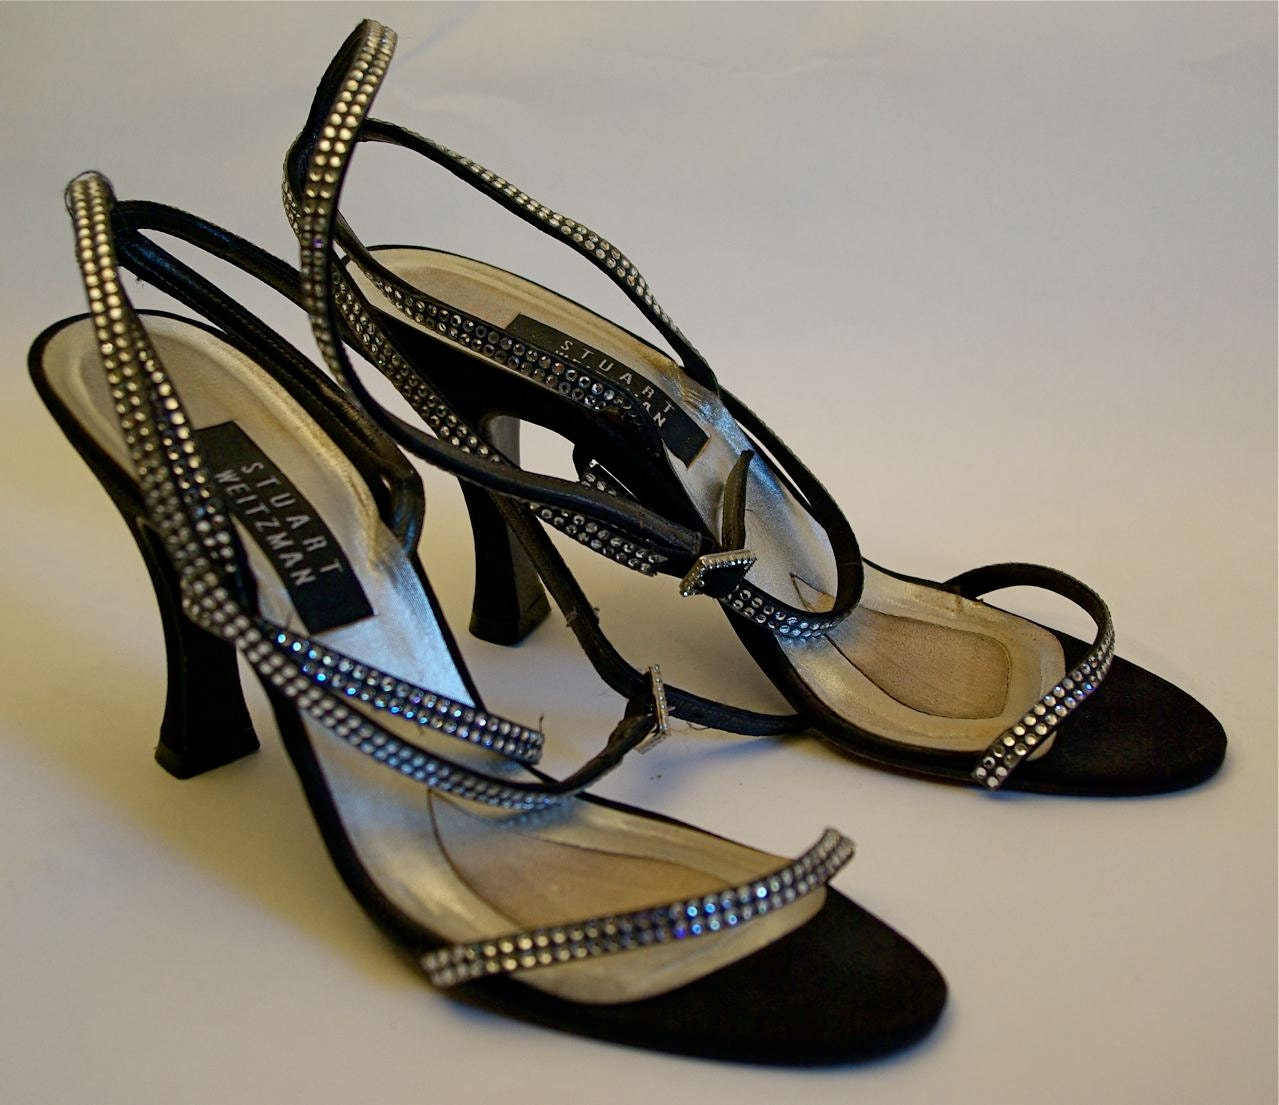 Stuart Weitzman rhinestone strappy sandals - kickshaw